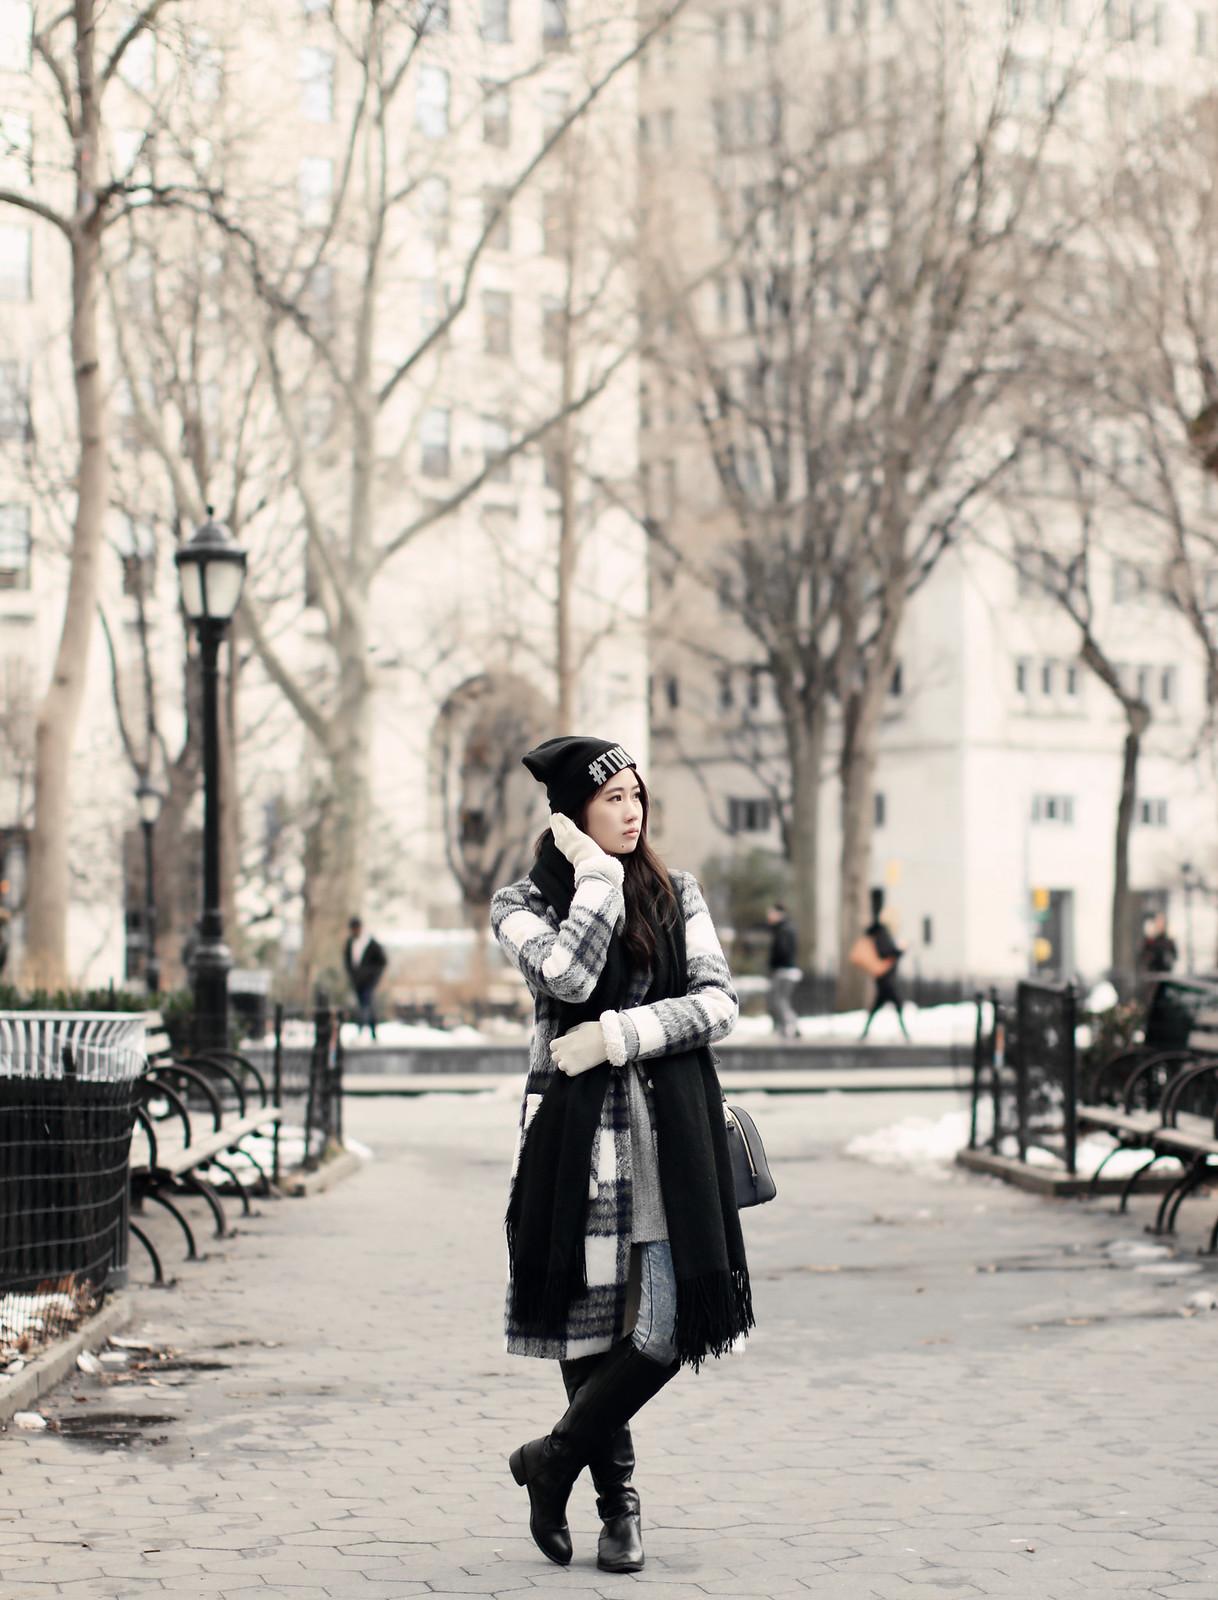 2062-clothestoyouuu-elizabeeetht-nyfw-newyorkfashionweek-nyc-fashionweek-newyork- winter2017-fashion-ootd